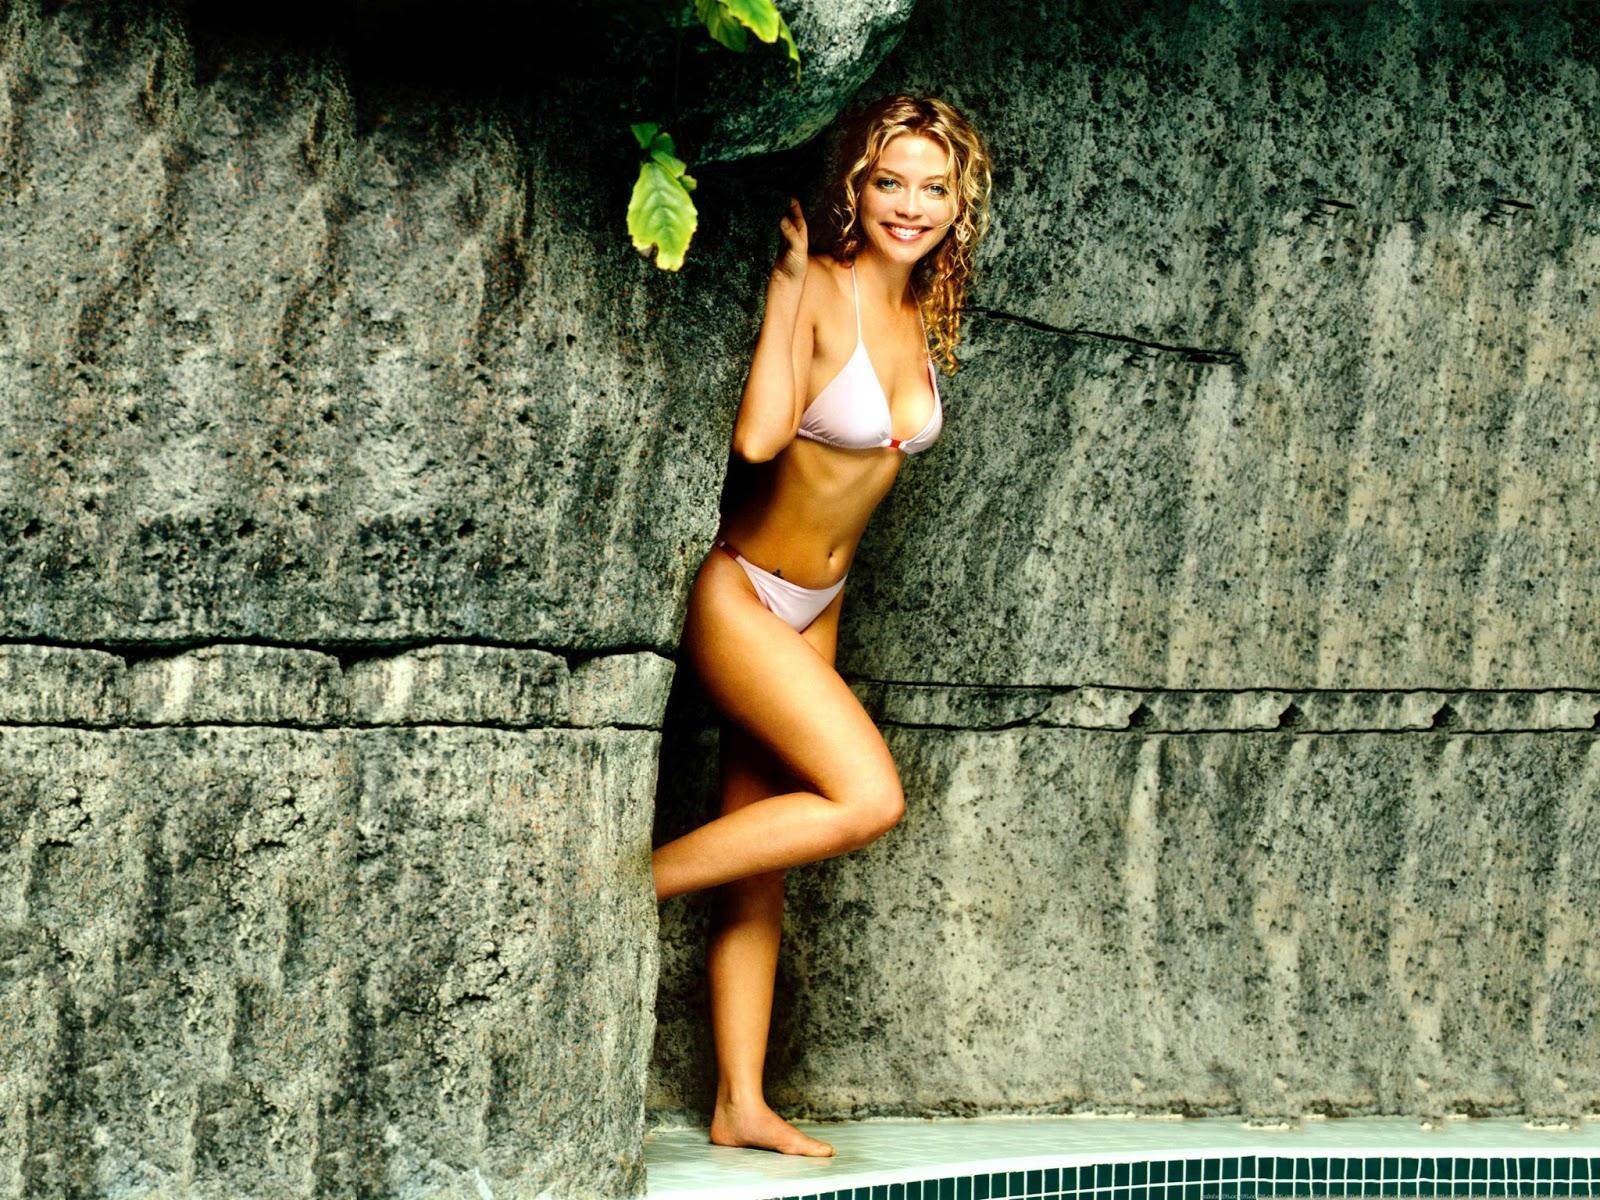 fucking-banging-nude-pics-amanda-detmer